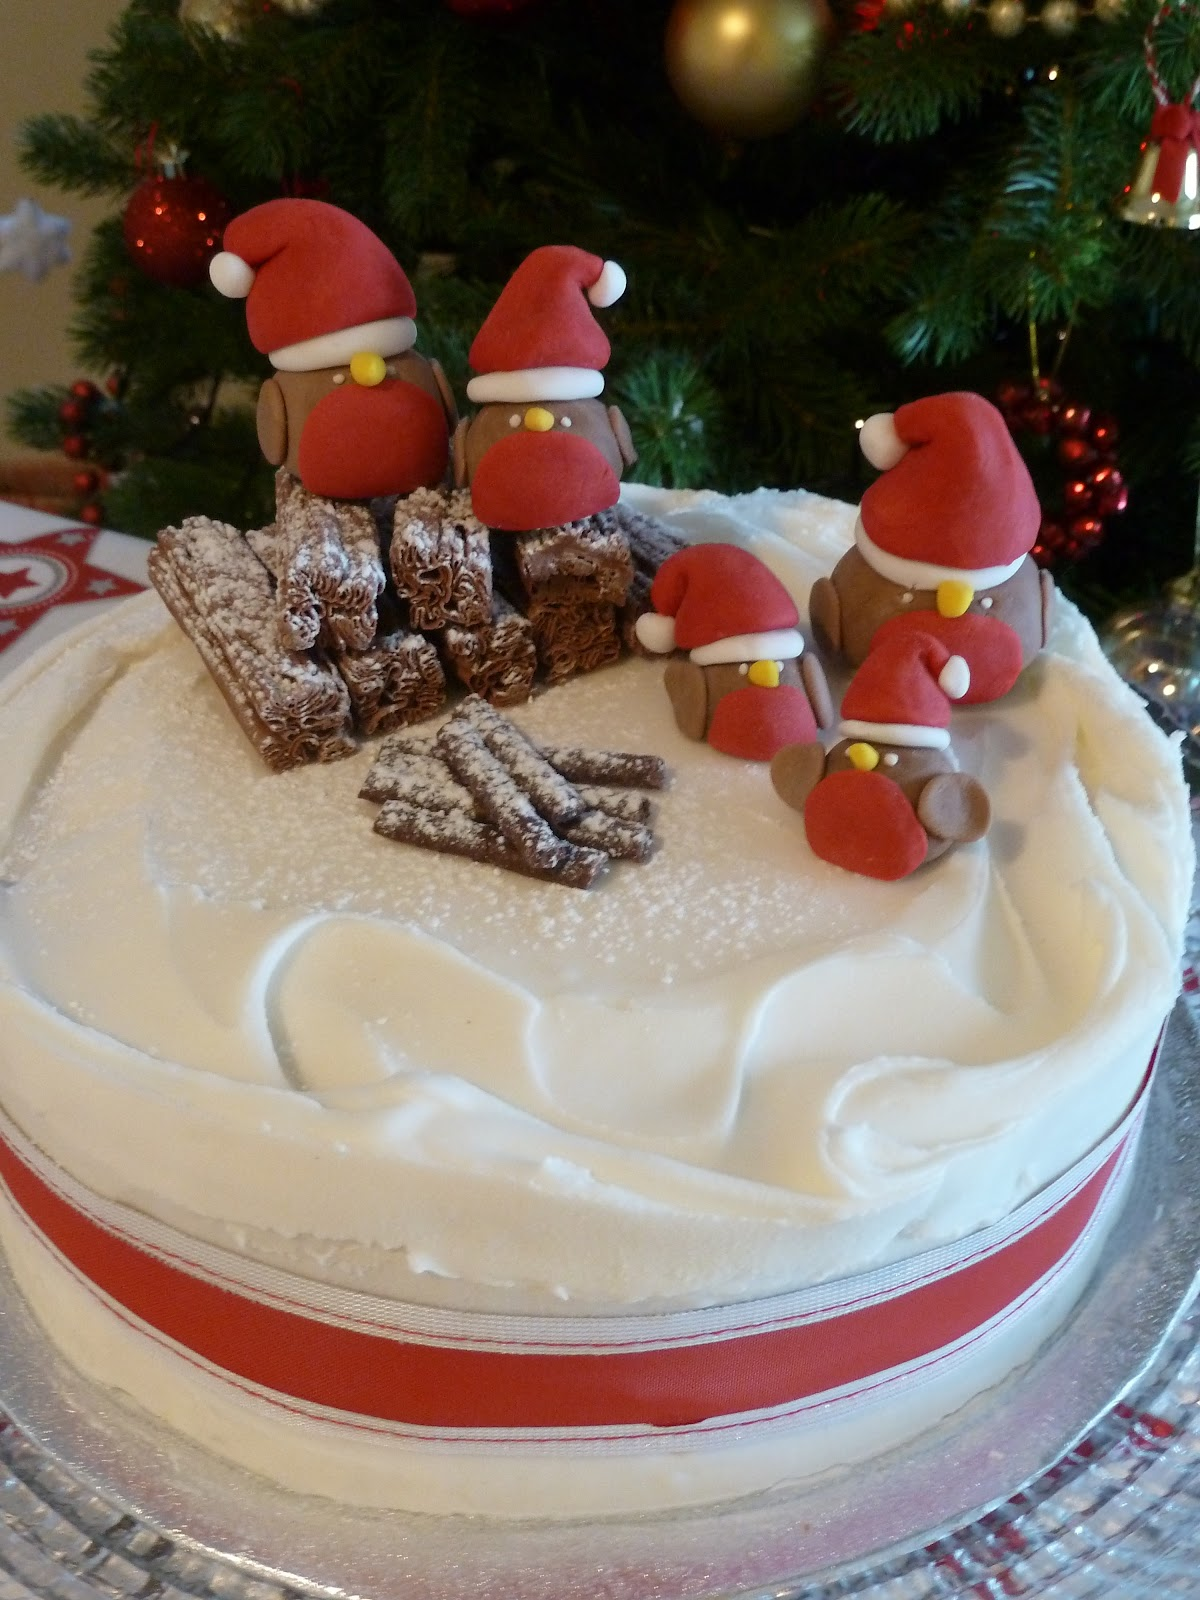 Christmas Cake Inspiration To Create Festive Robins Cake Garden Tea Cakes And Me